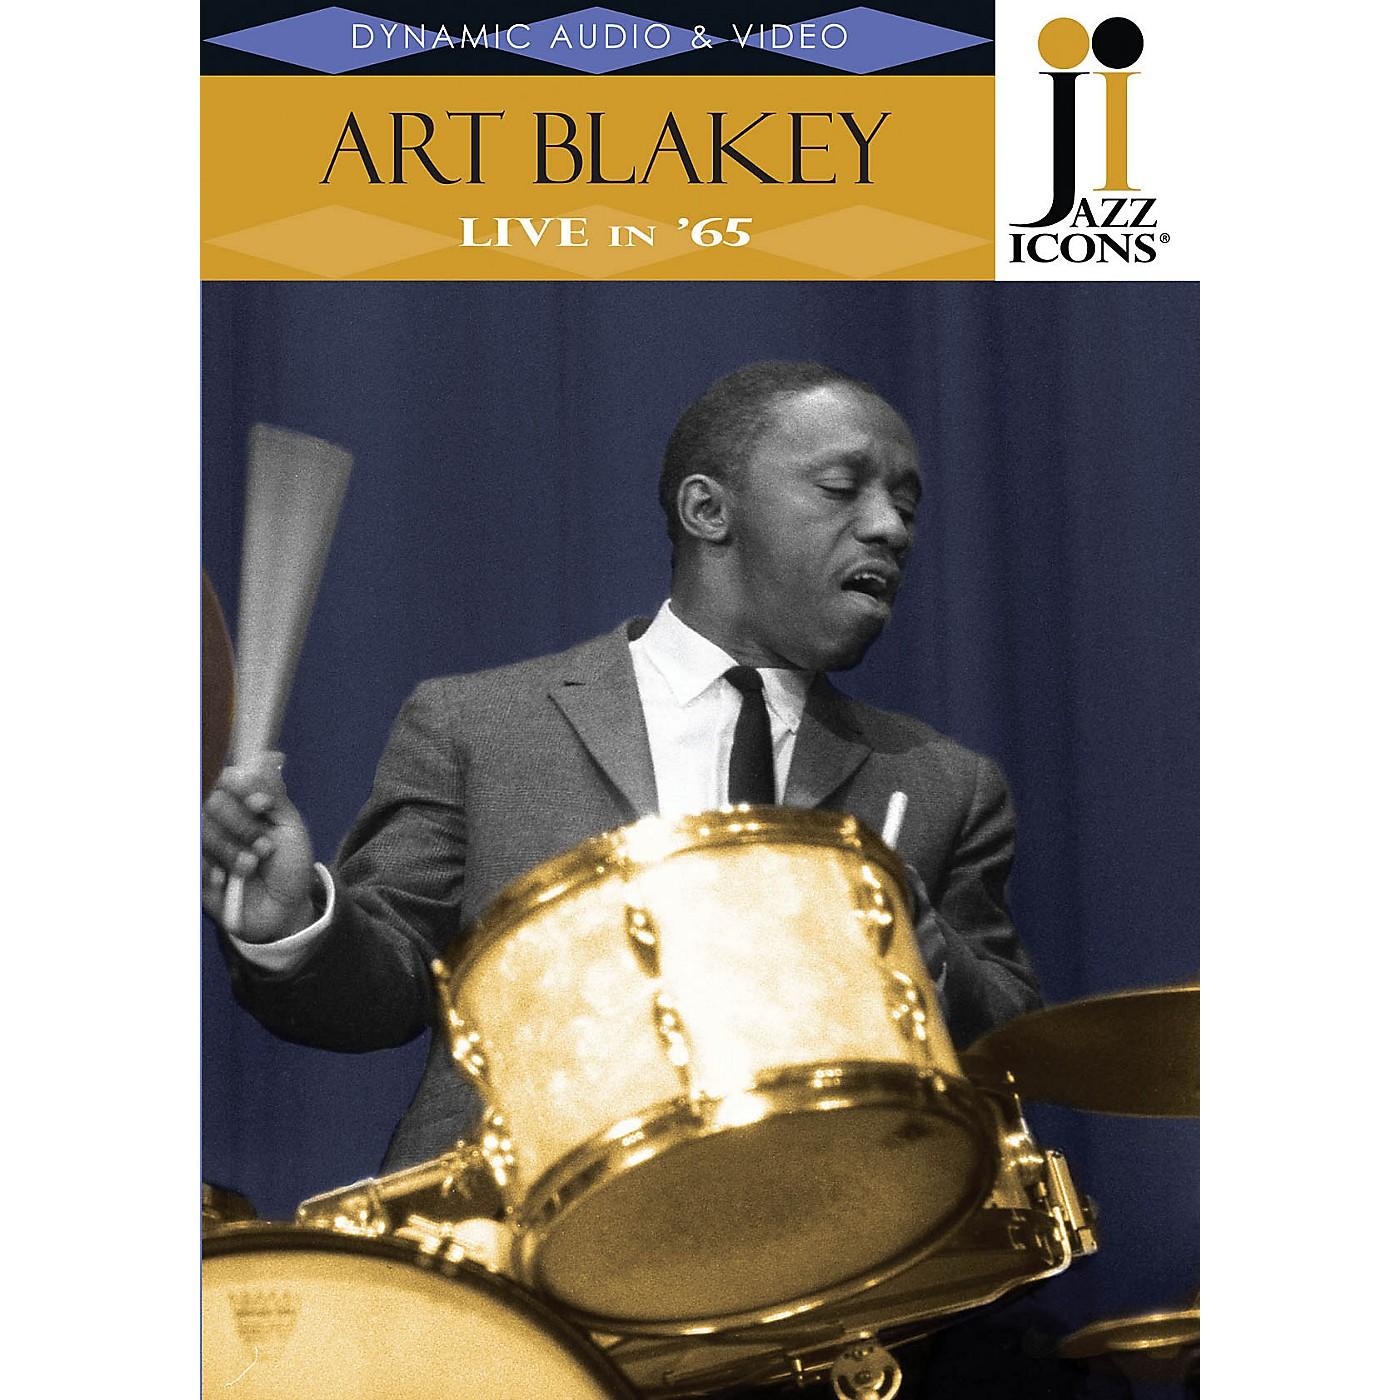 Jazz Icons Art Blakey - Live in '65 (Jazz Icons DVD) DVD Series DVD Performed by Art Blakey & The Jazz Messengers thumbnail